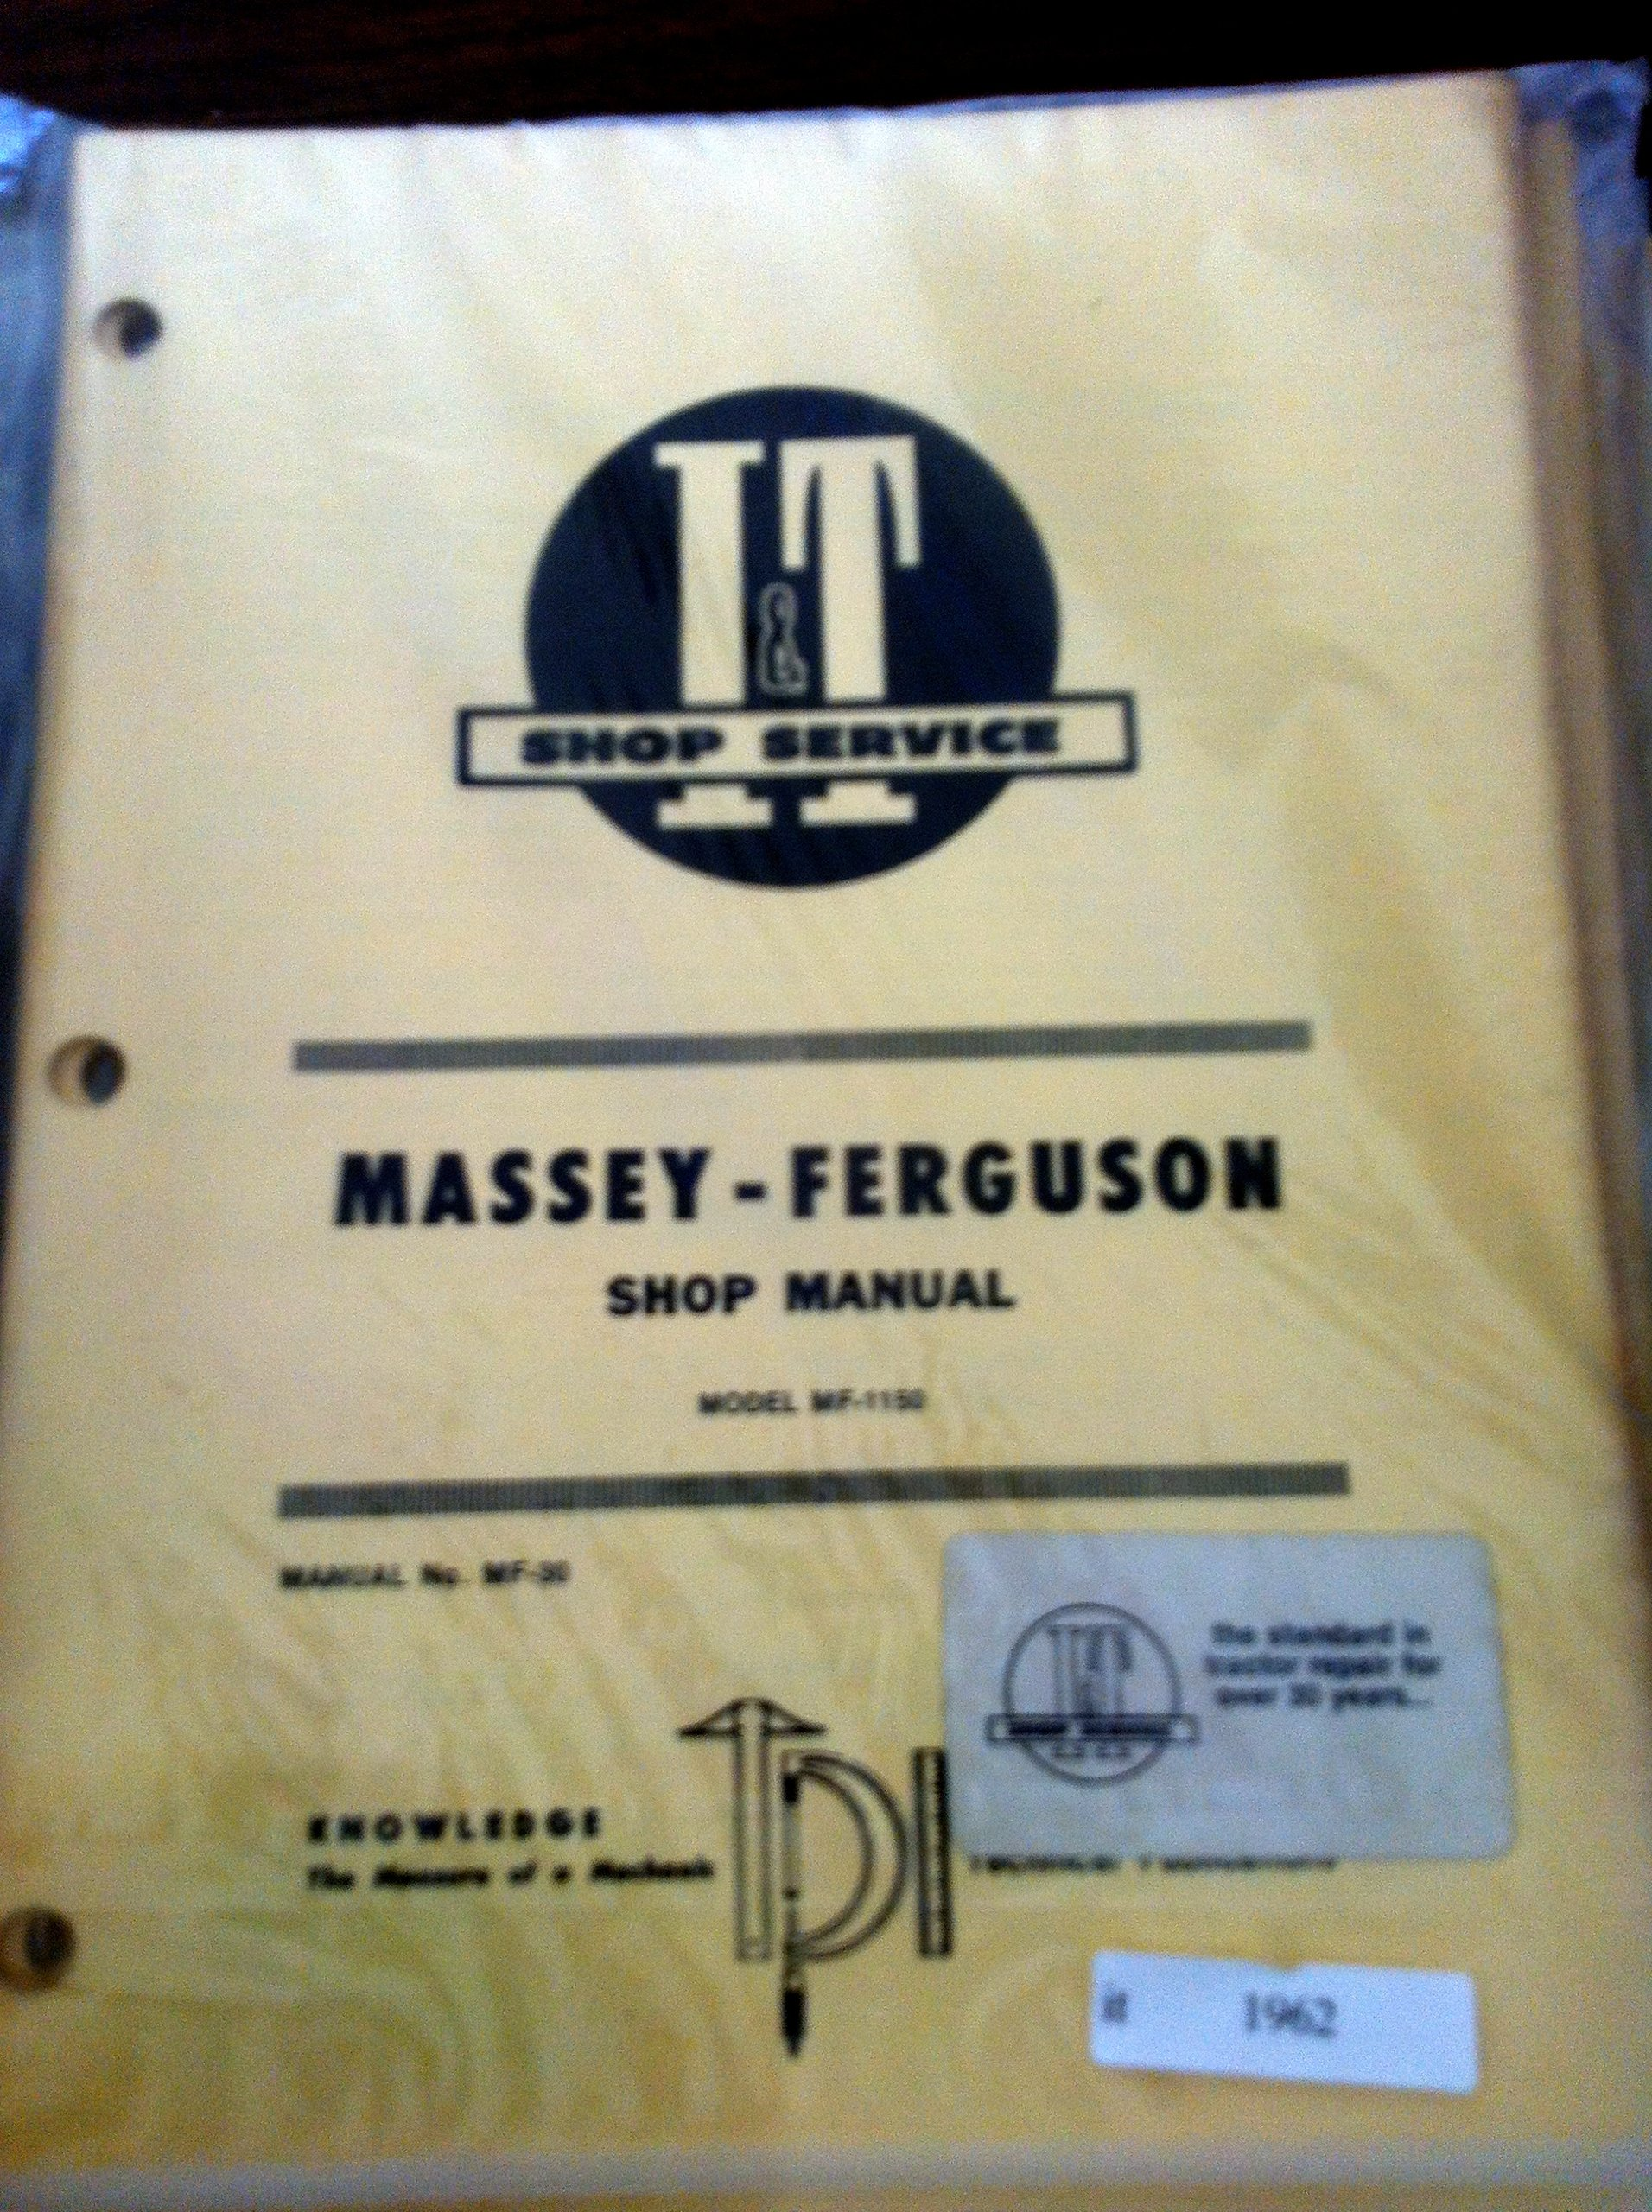 Massey Ferguson I&T Shop Service Manual MF 1150: Amazon.com: Books